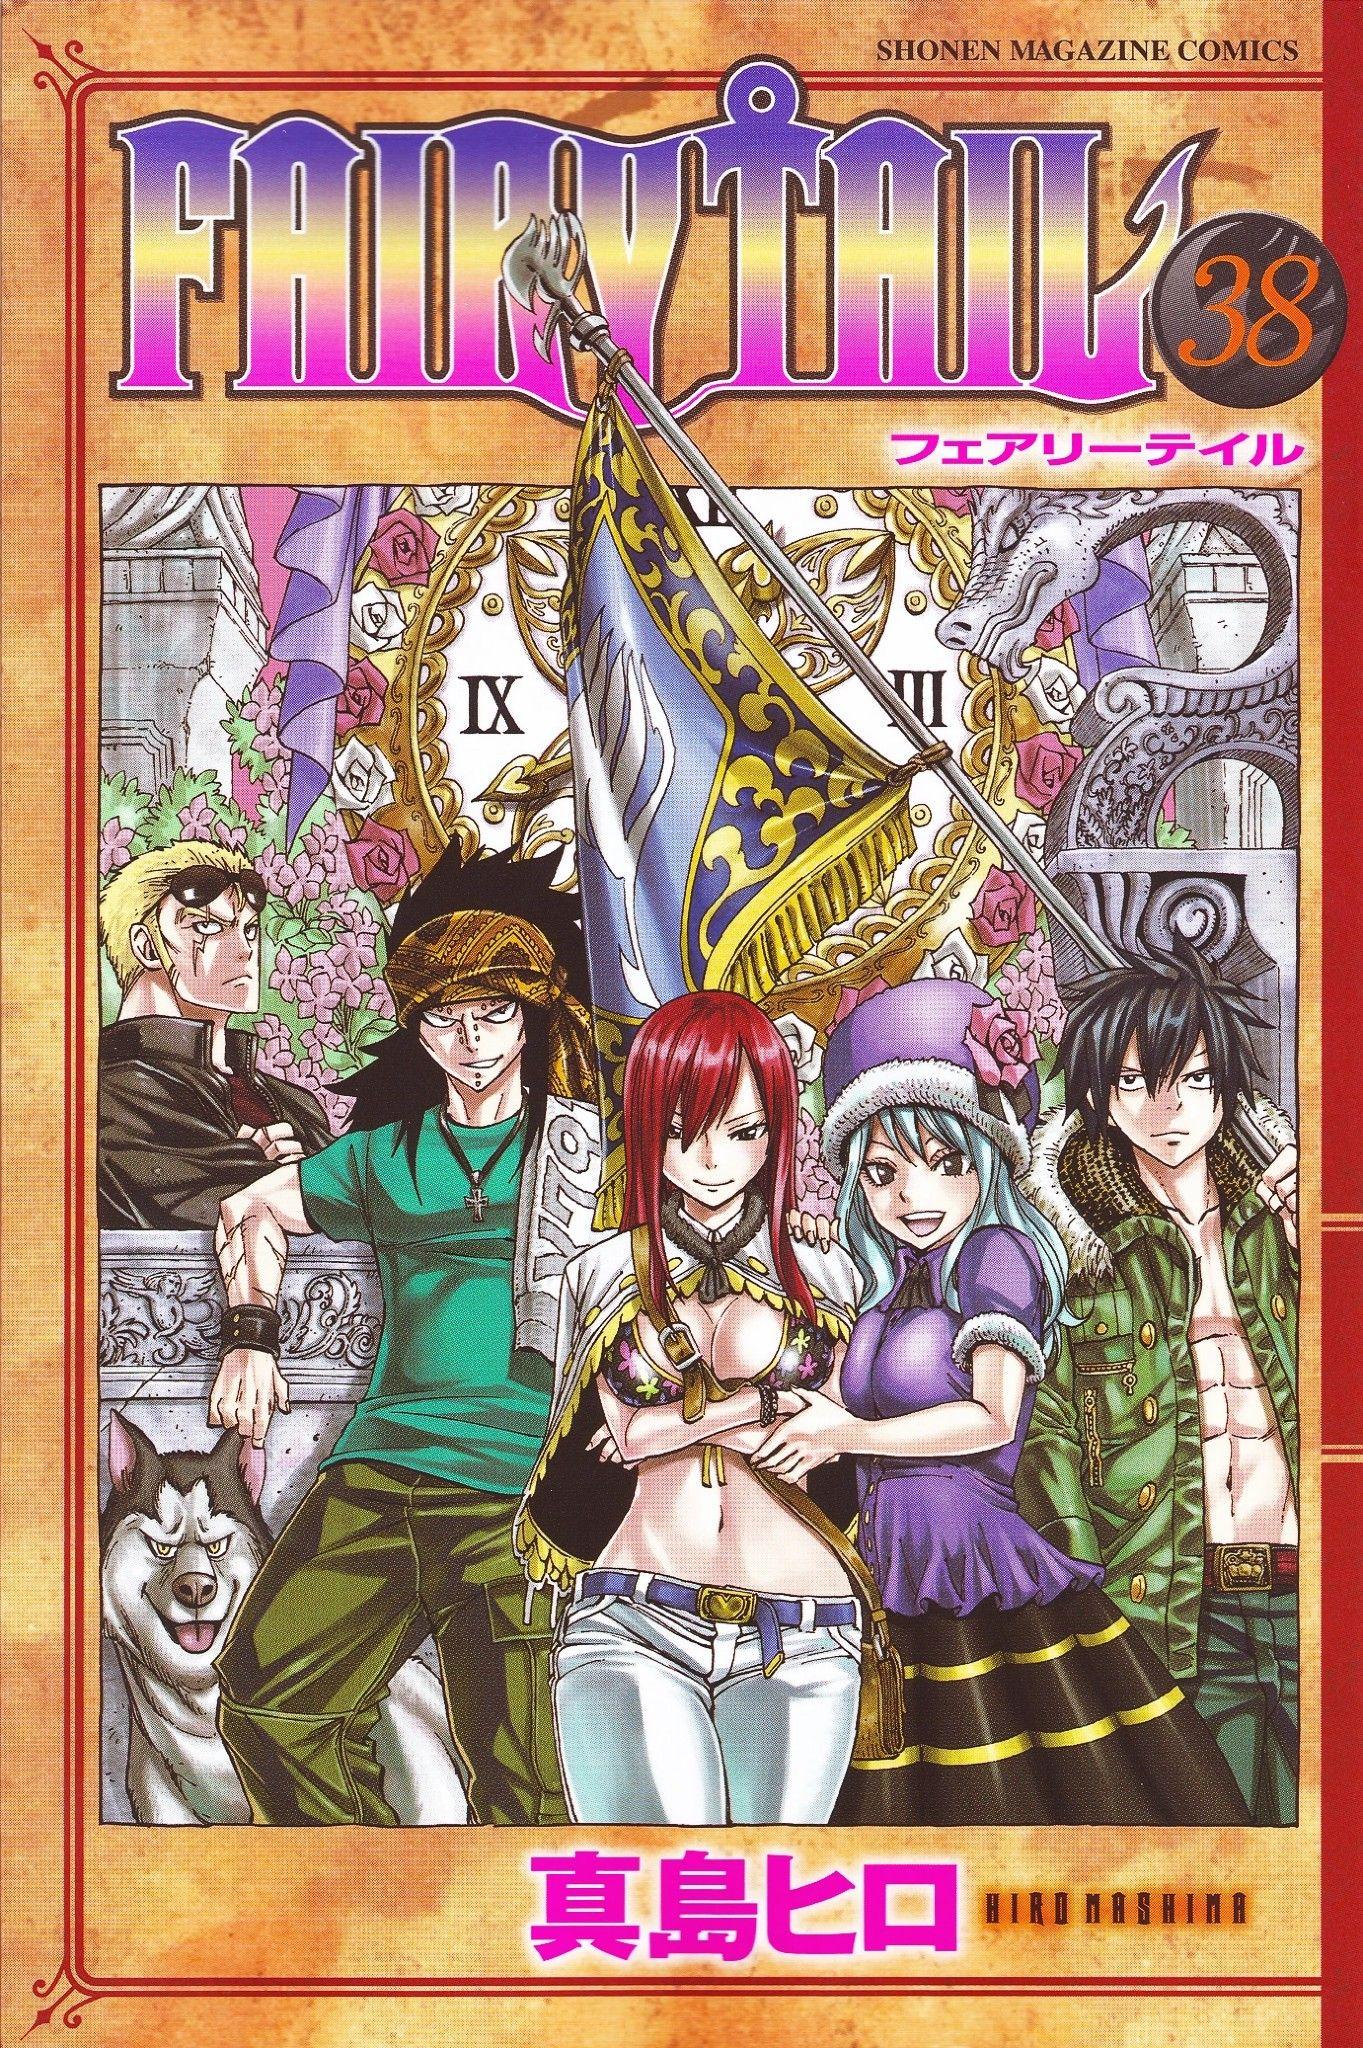 Pin by enpitsu on Hiro Mashima in 2020 Fairy tail manga